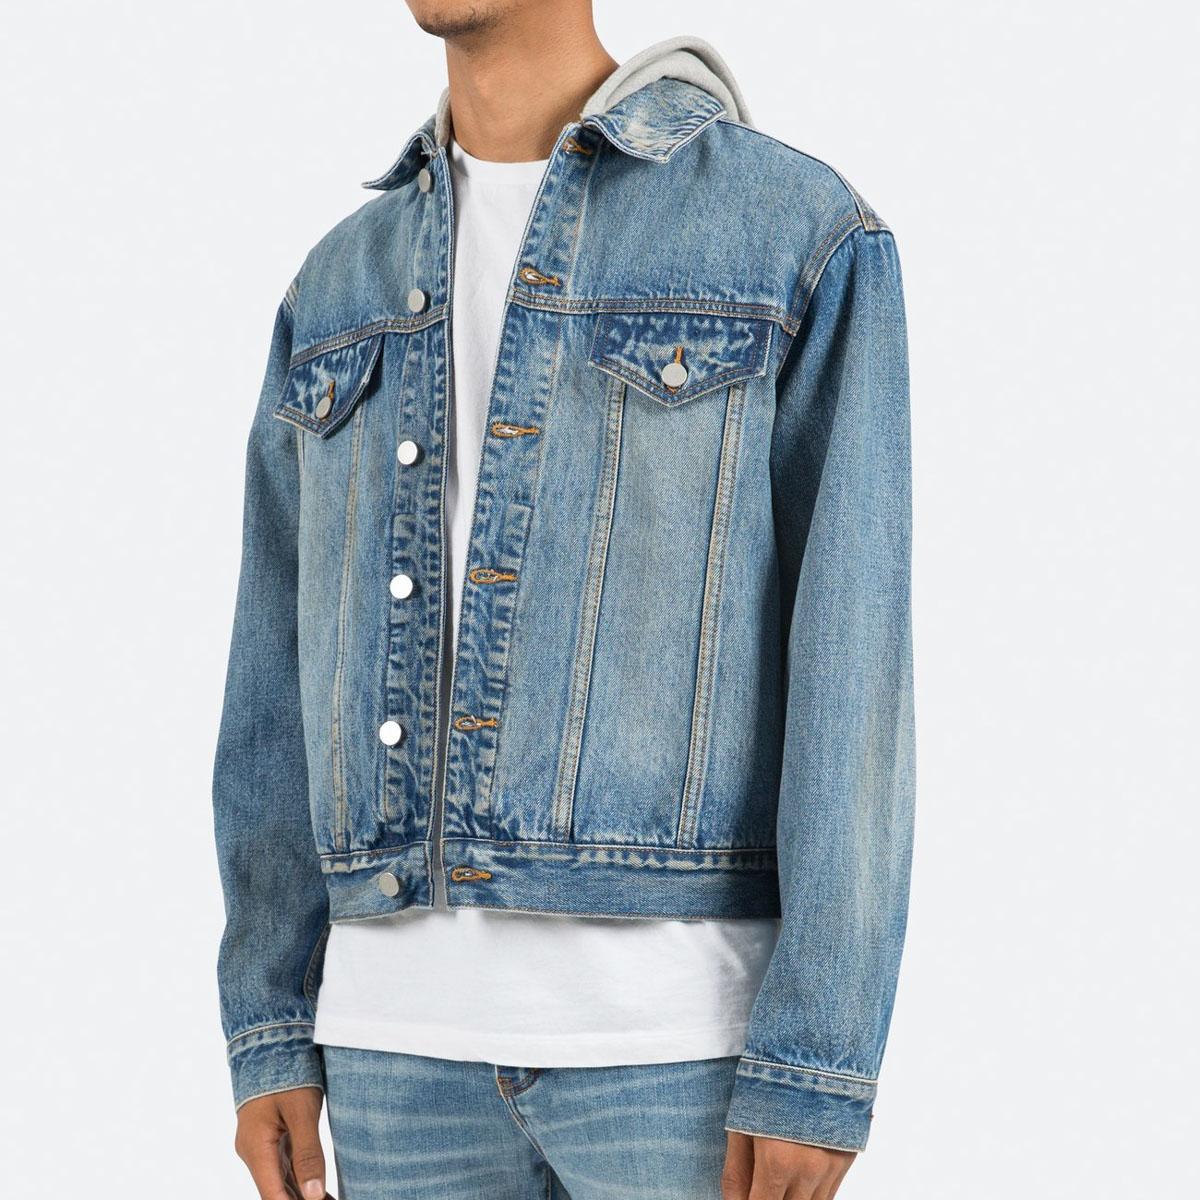 mnml-denim-jacket-payday-pickups-man-for-himself